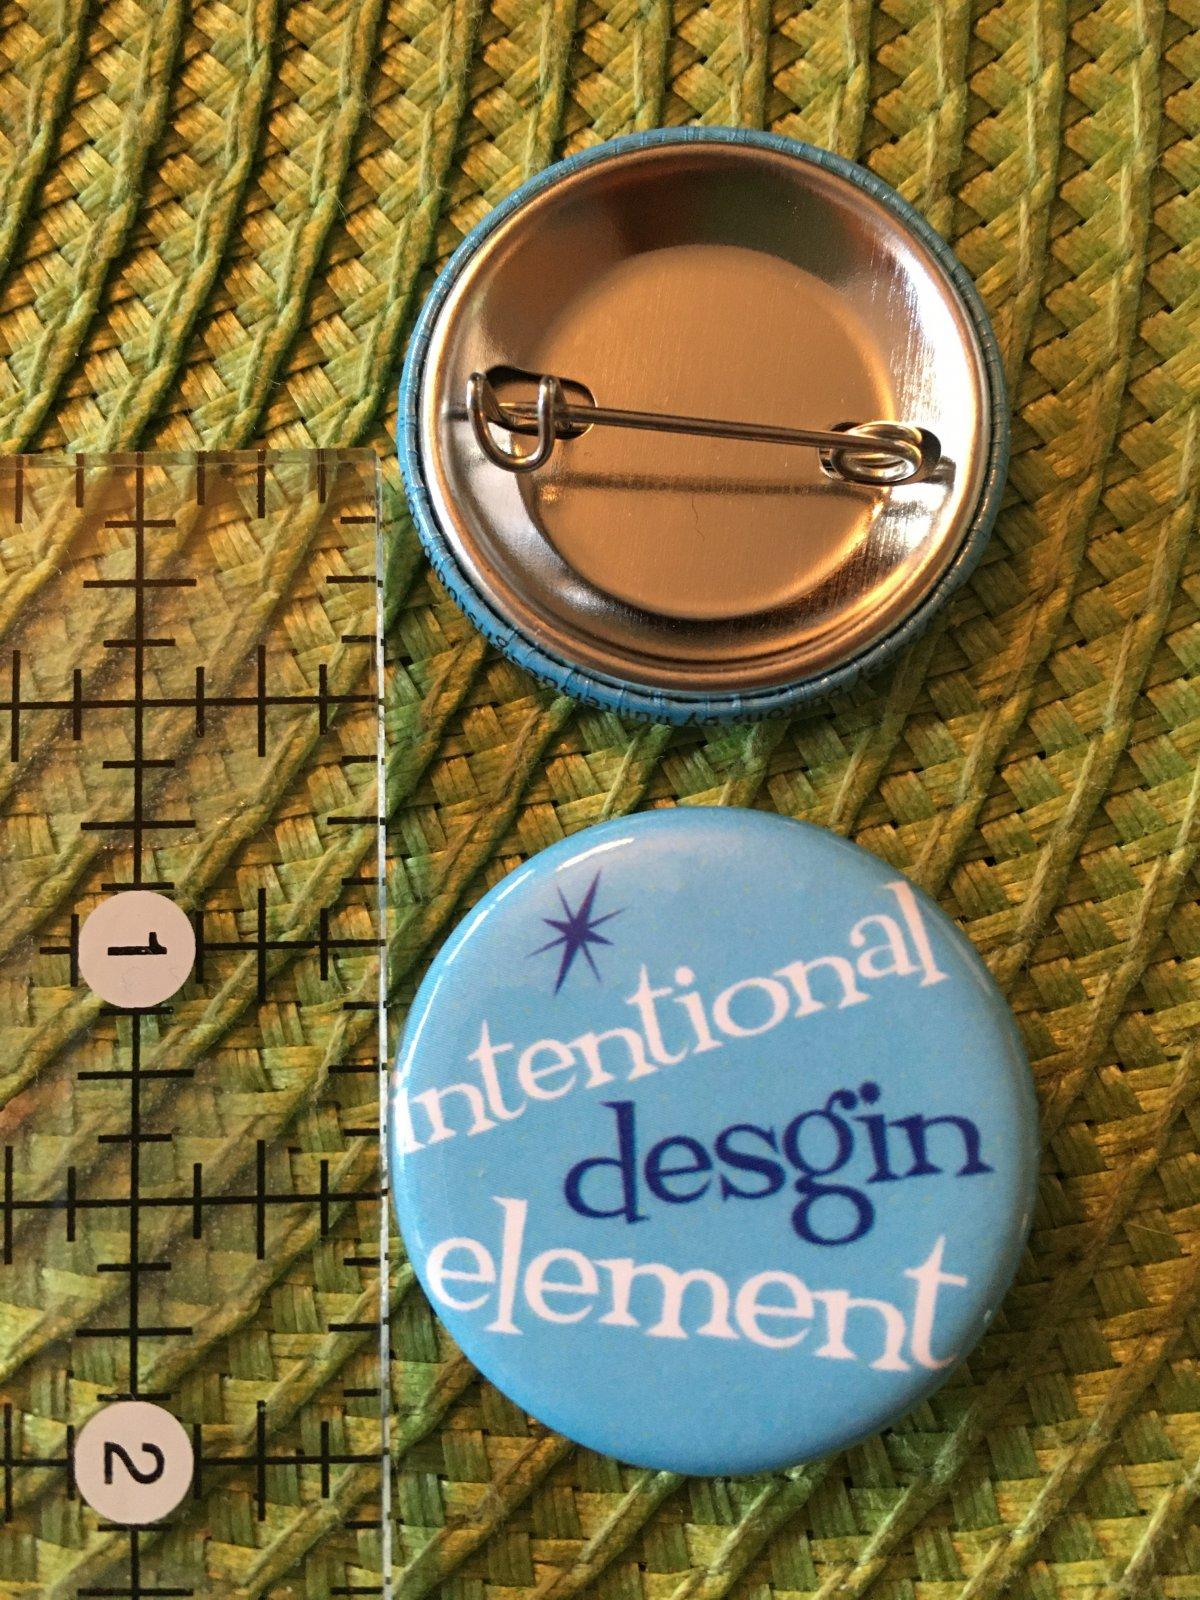 *Sew Sassy Button - Intentional Desgin Element - IDE